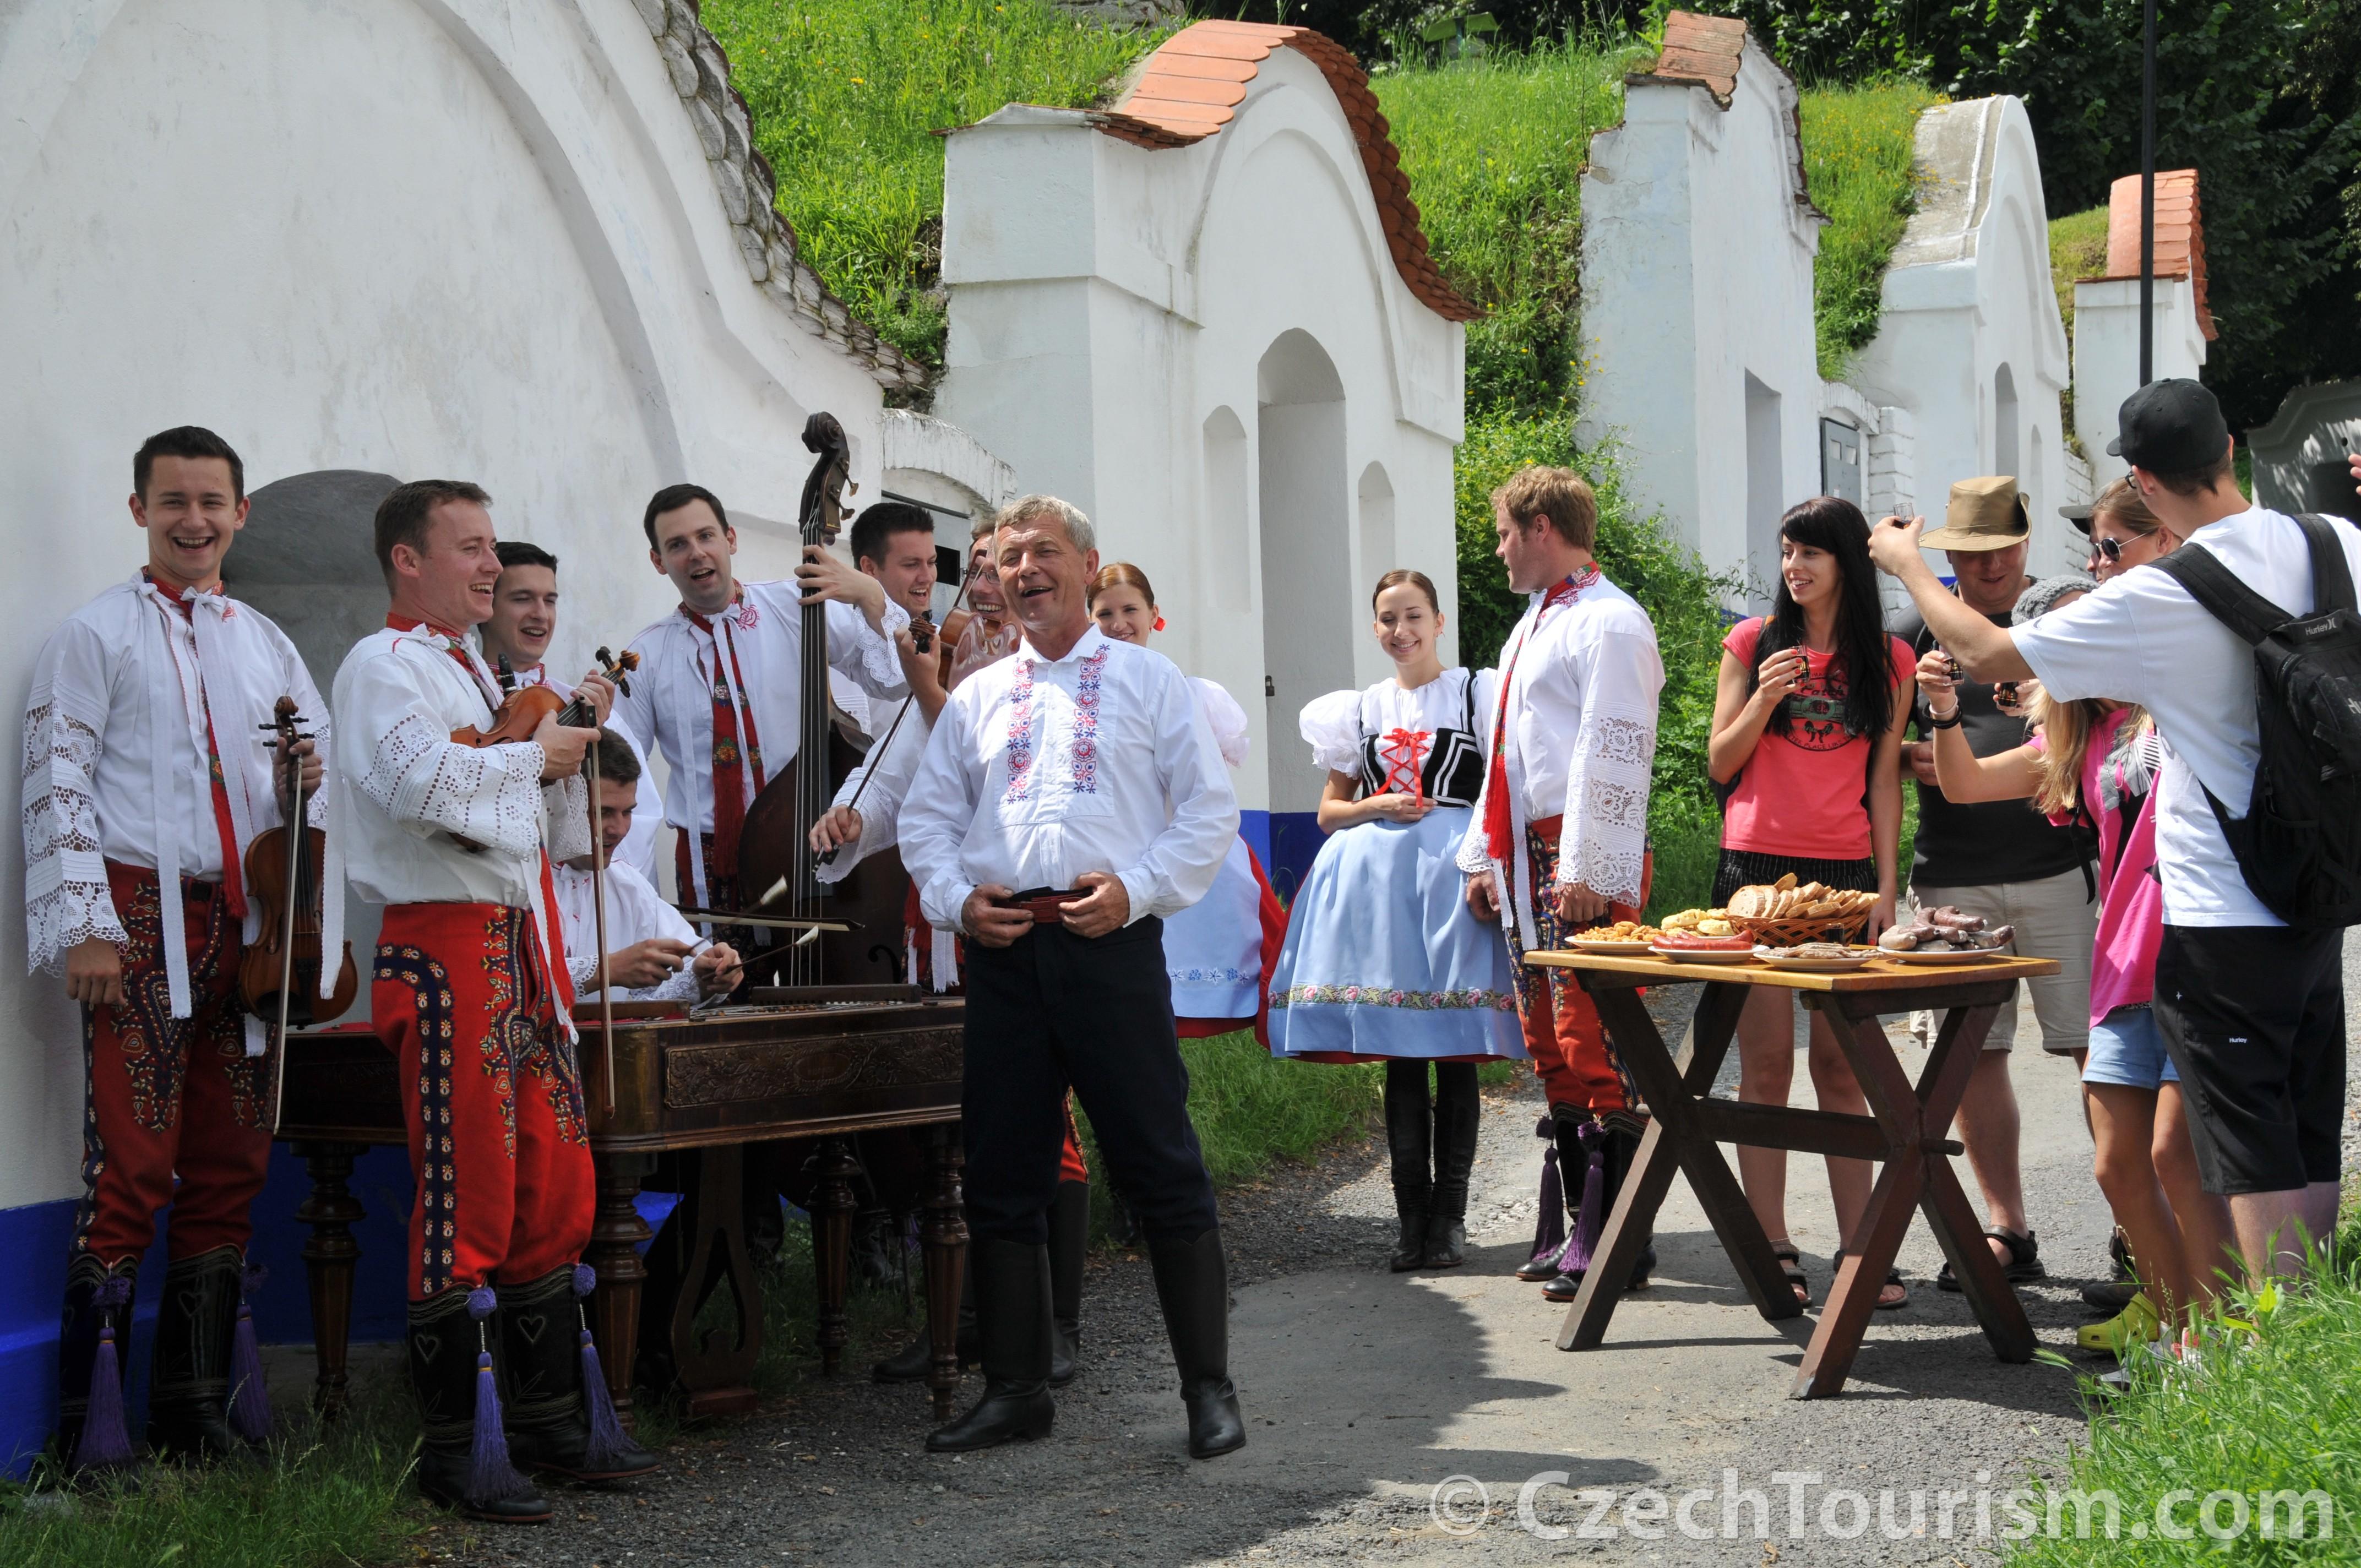 kudy_z_nudy_-_vinarska_turistika_2_4288x2848